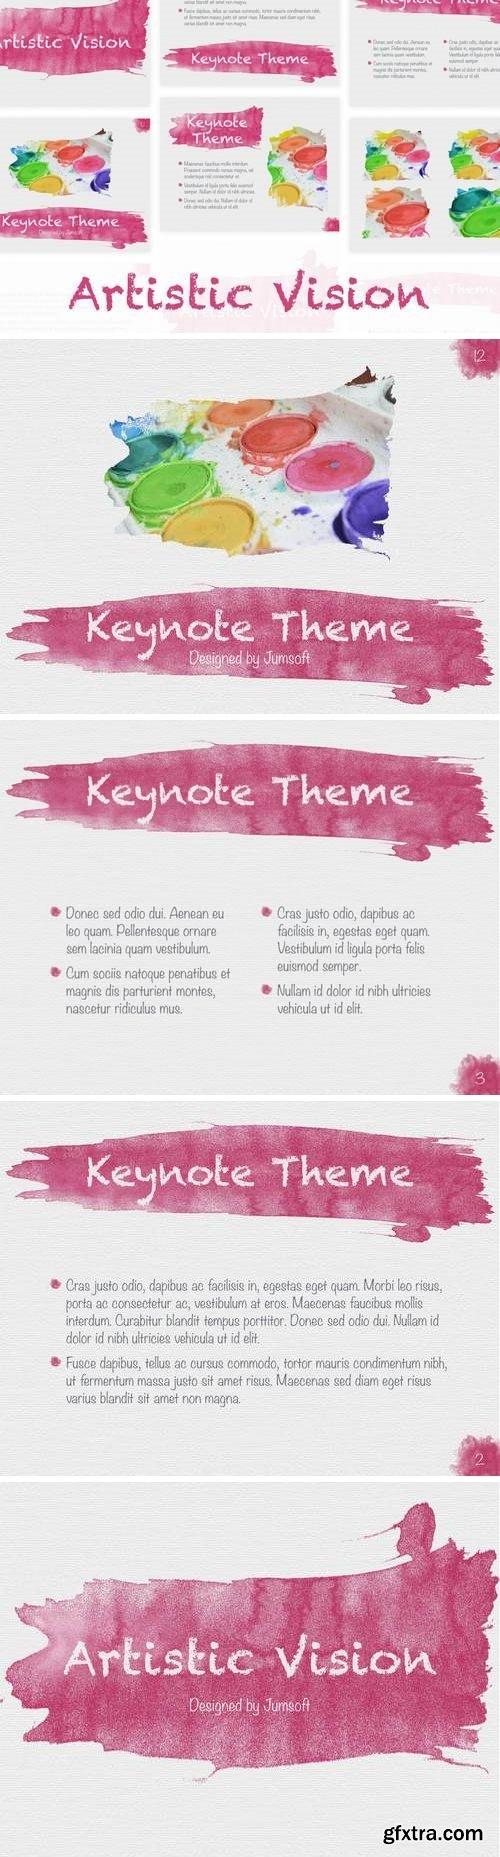 Artistic Visions Keynote template